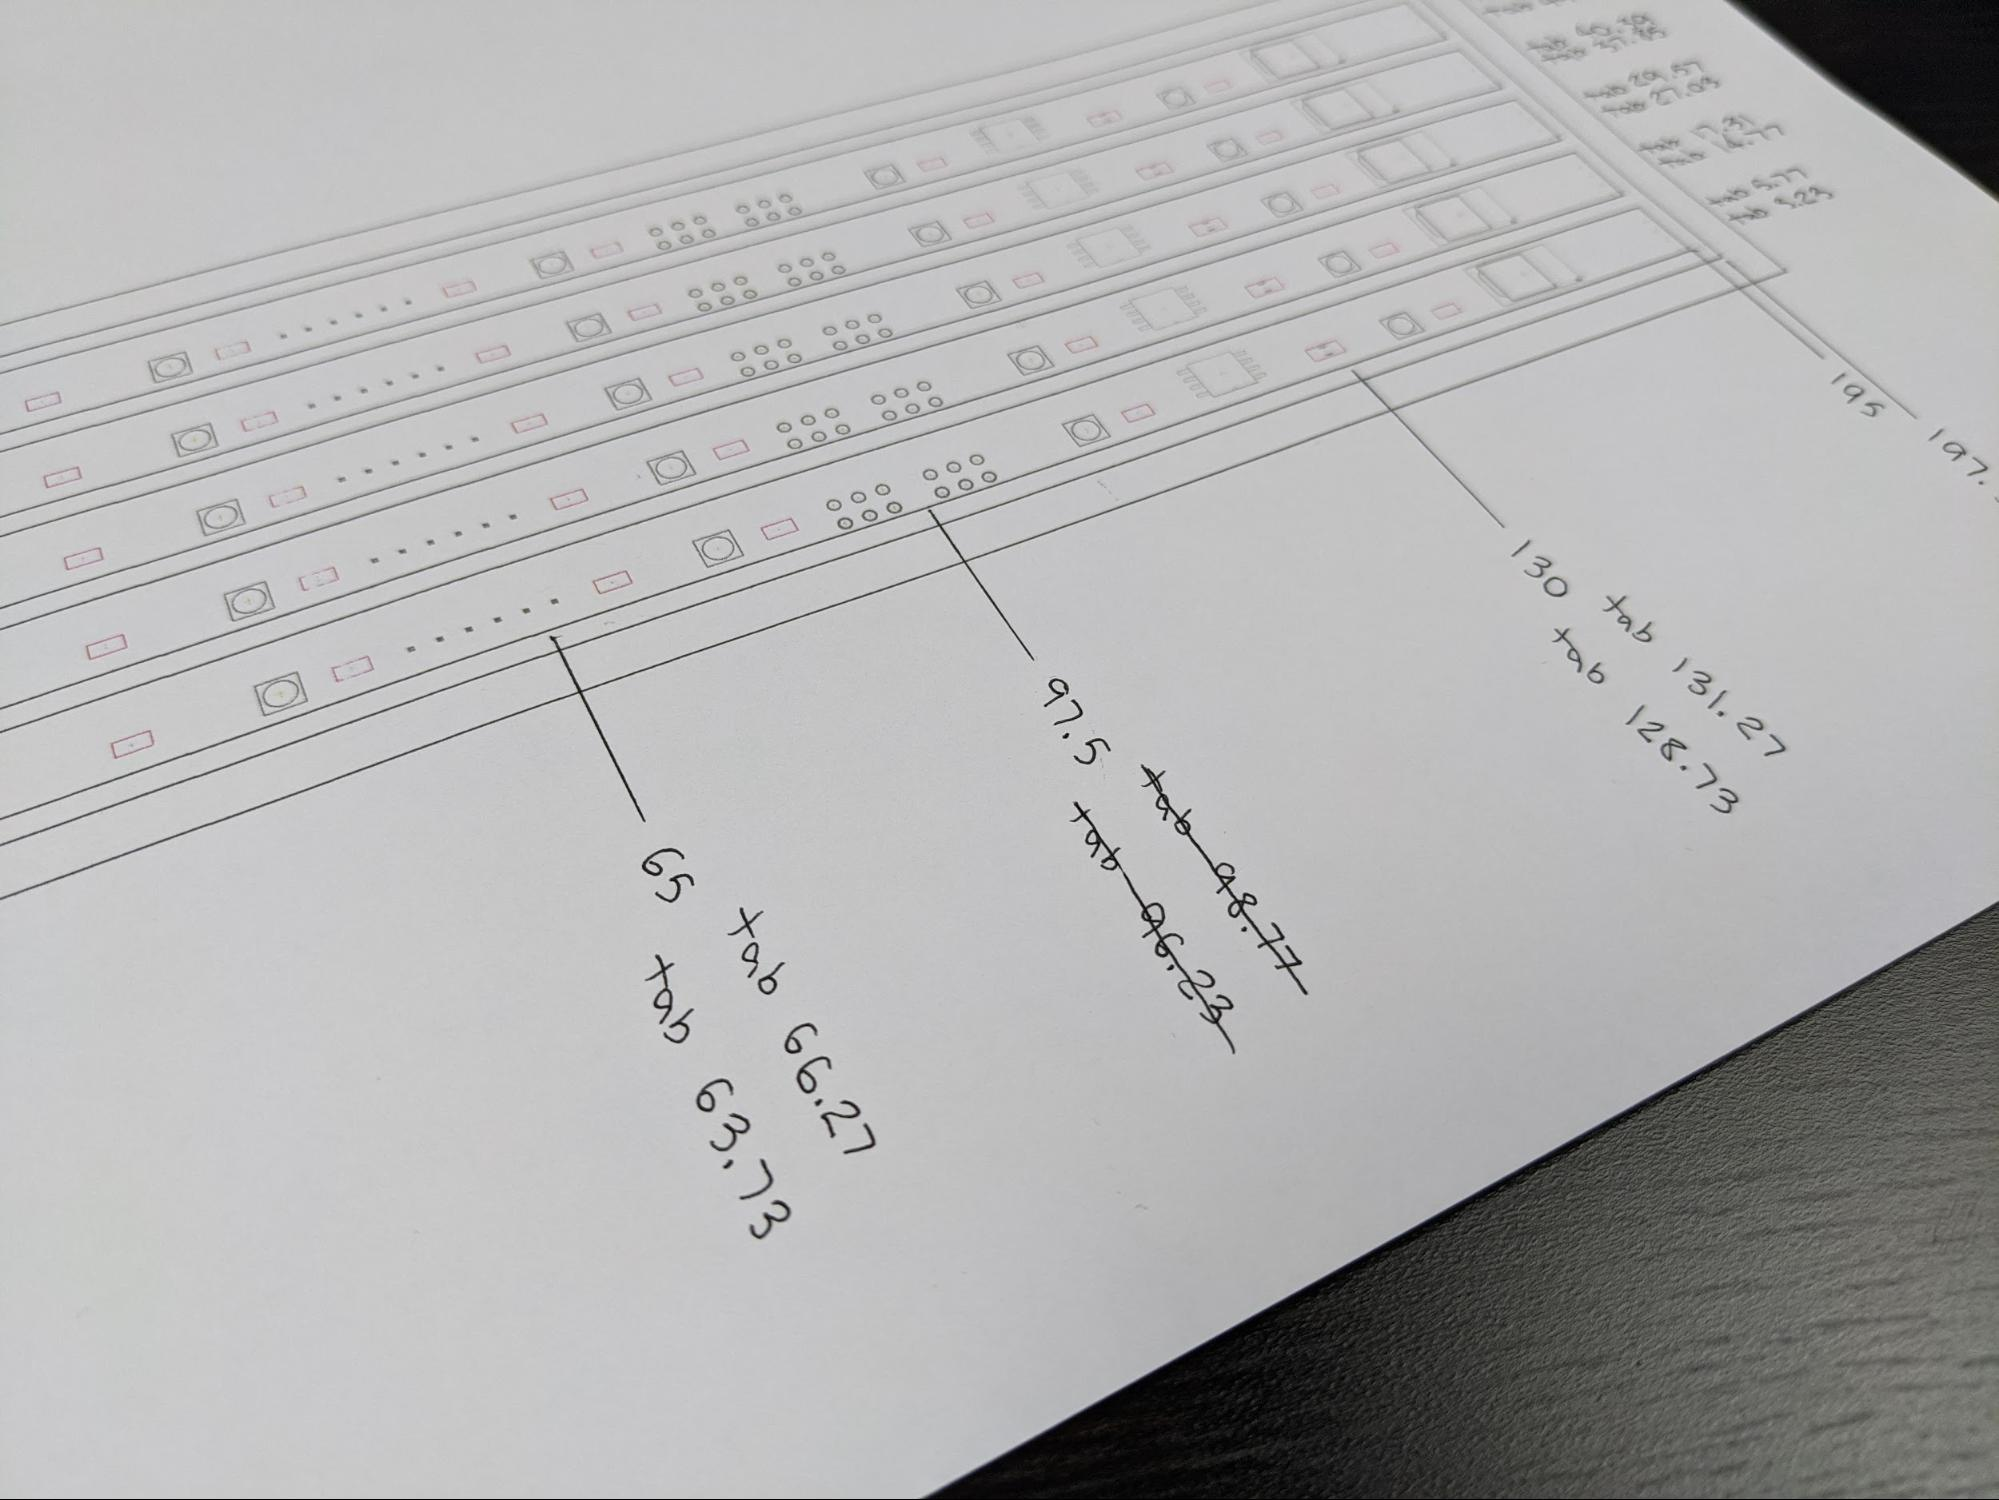 Tab_Route_Panel_SH_MP_image12.jpg